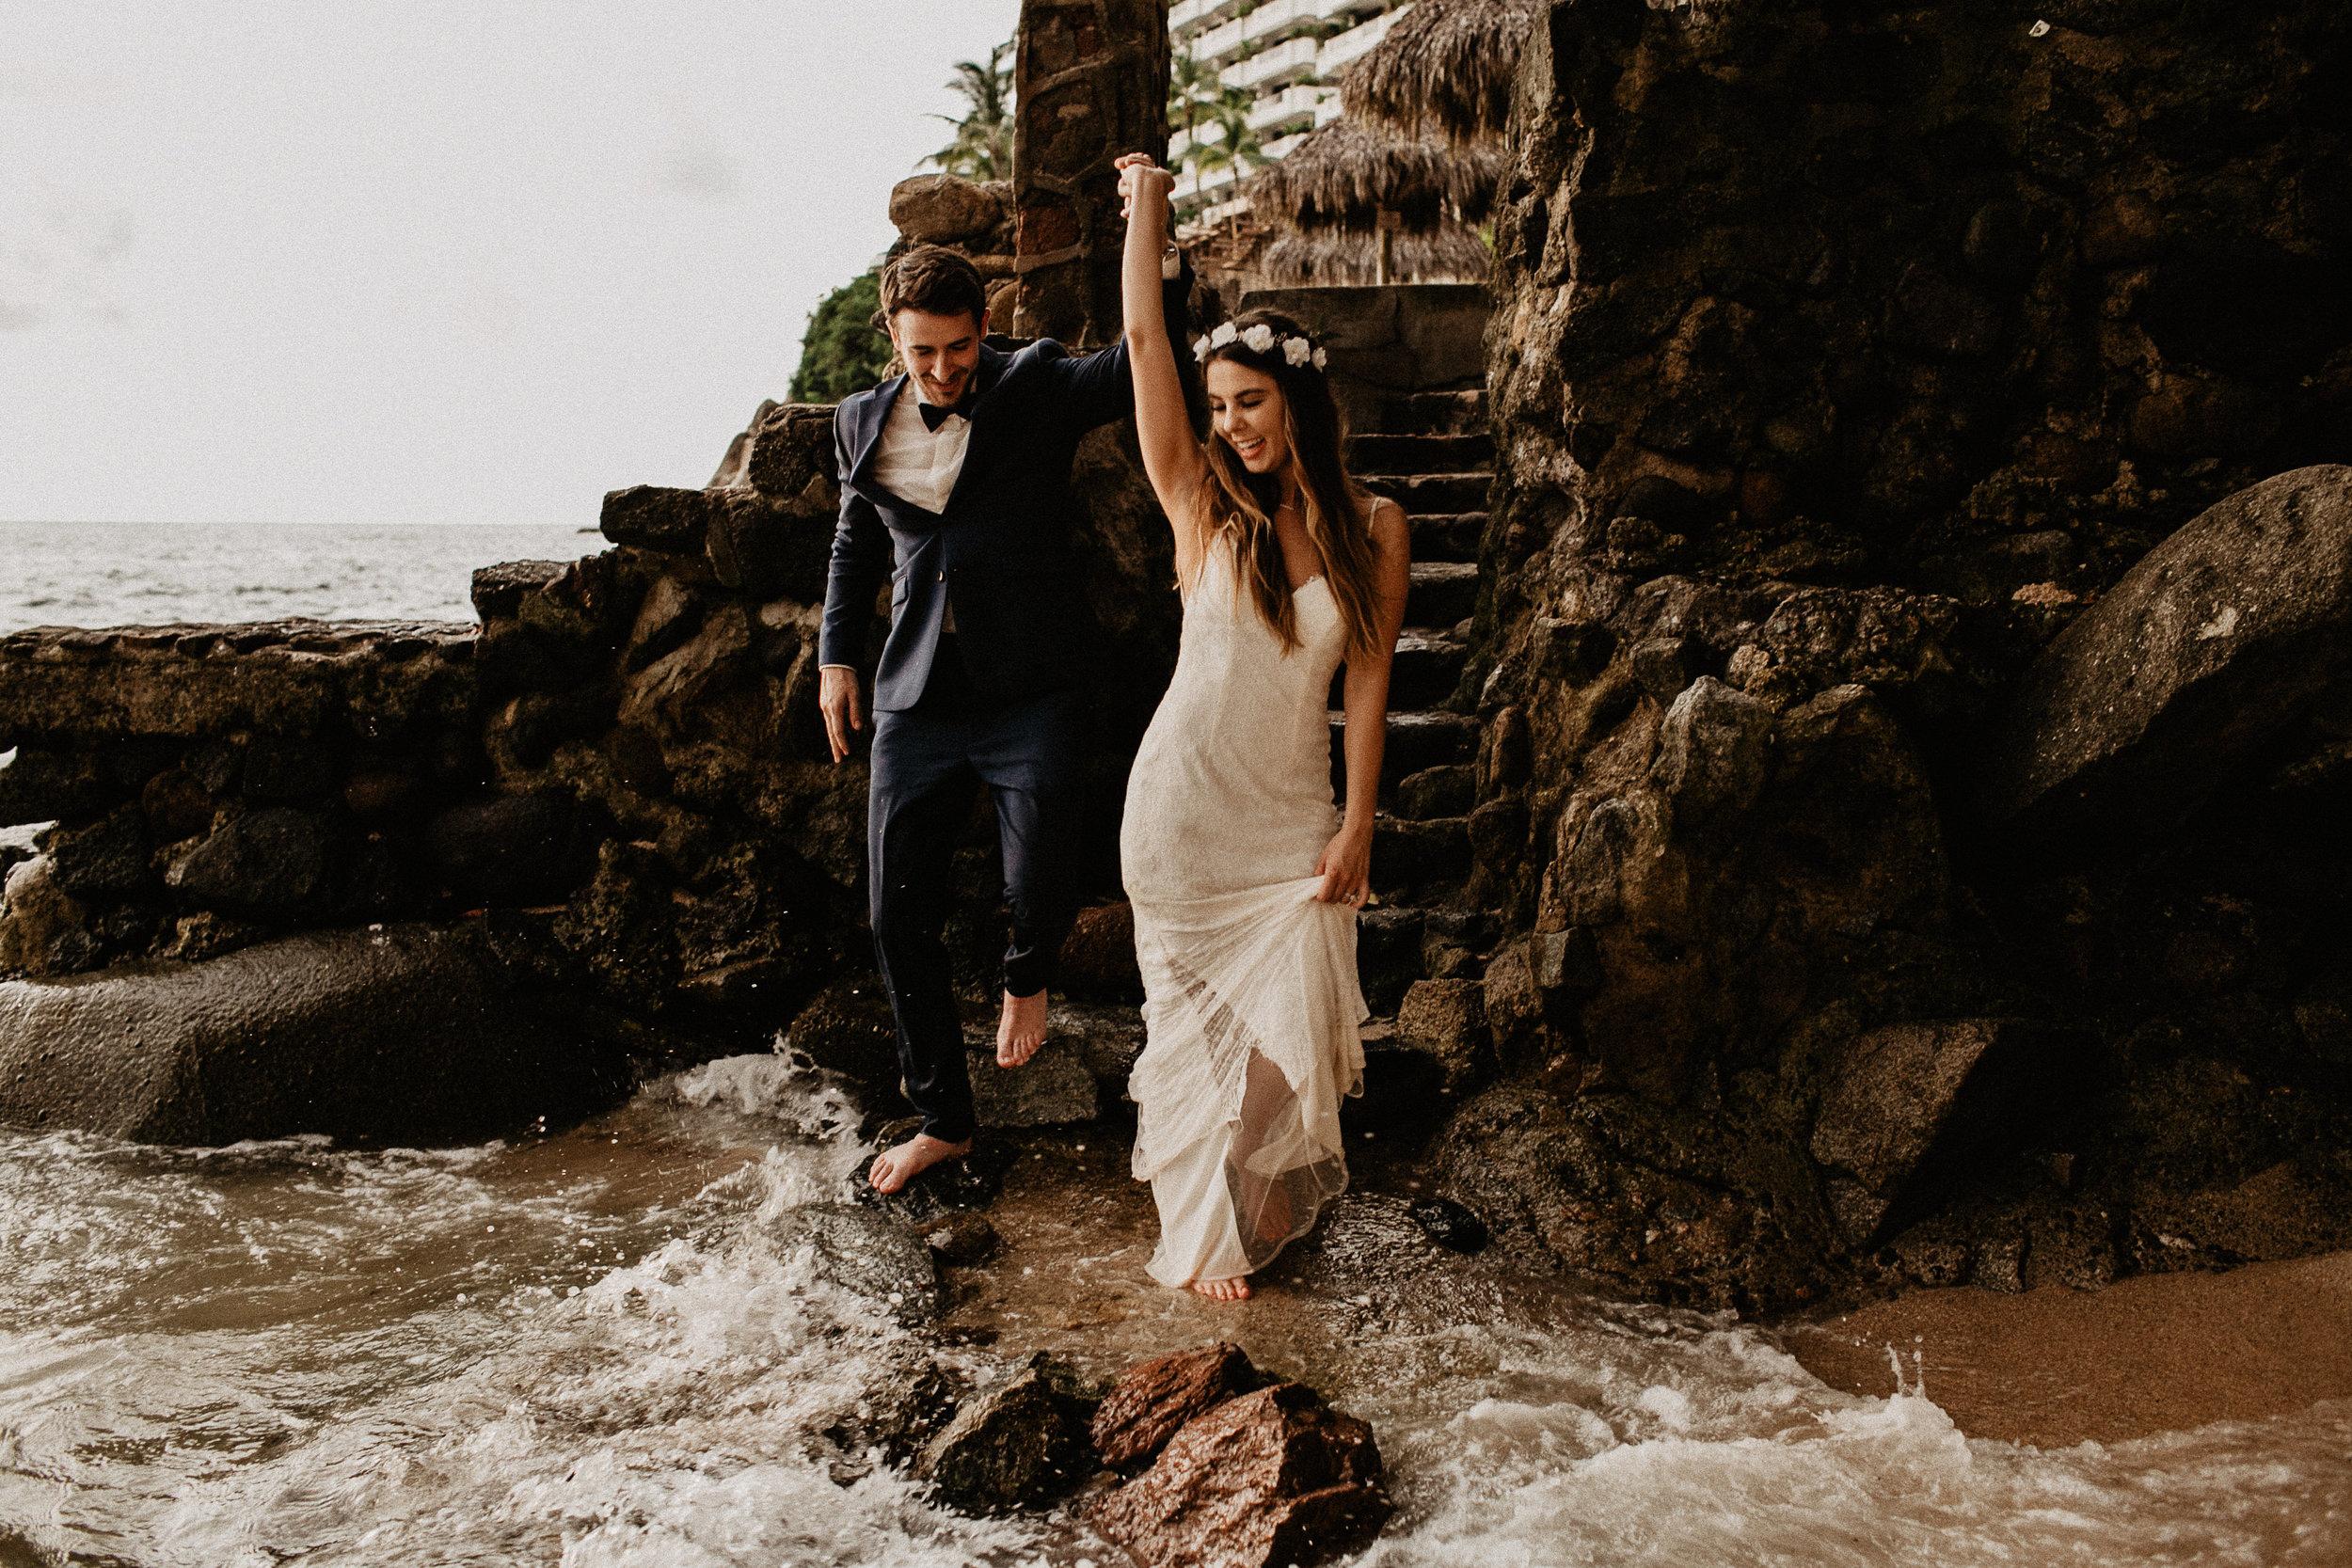 alfonso_flores_destination_wedding_photography_puerto_vallarta_hotel_barcelo_vallarta_cuttler_amela-758.JPG